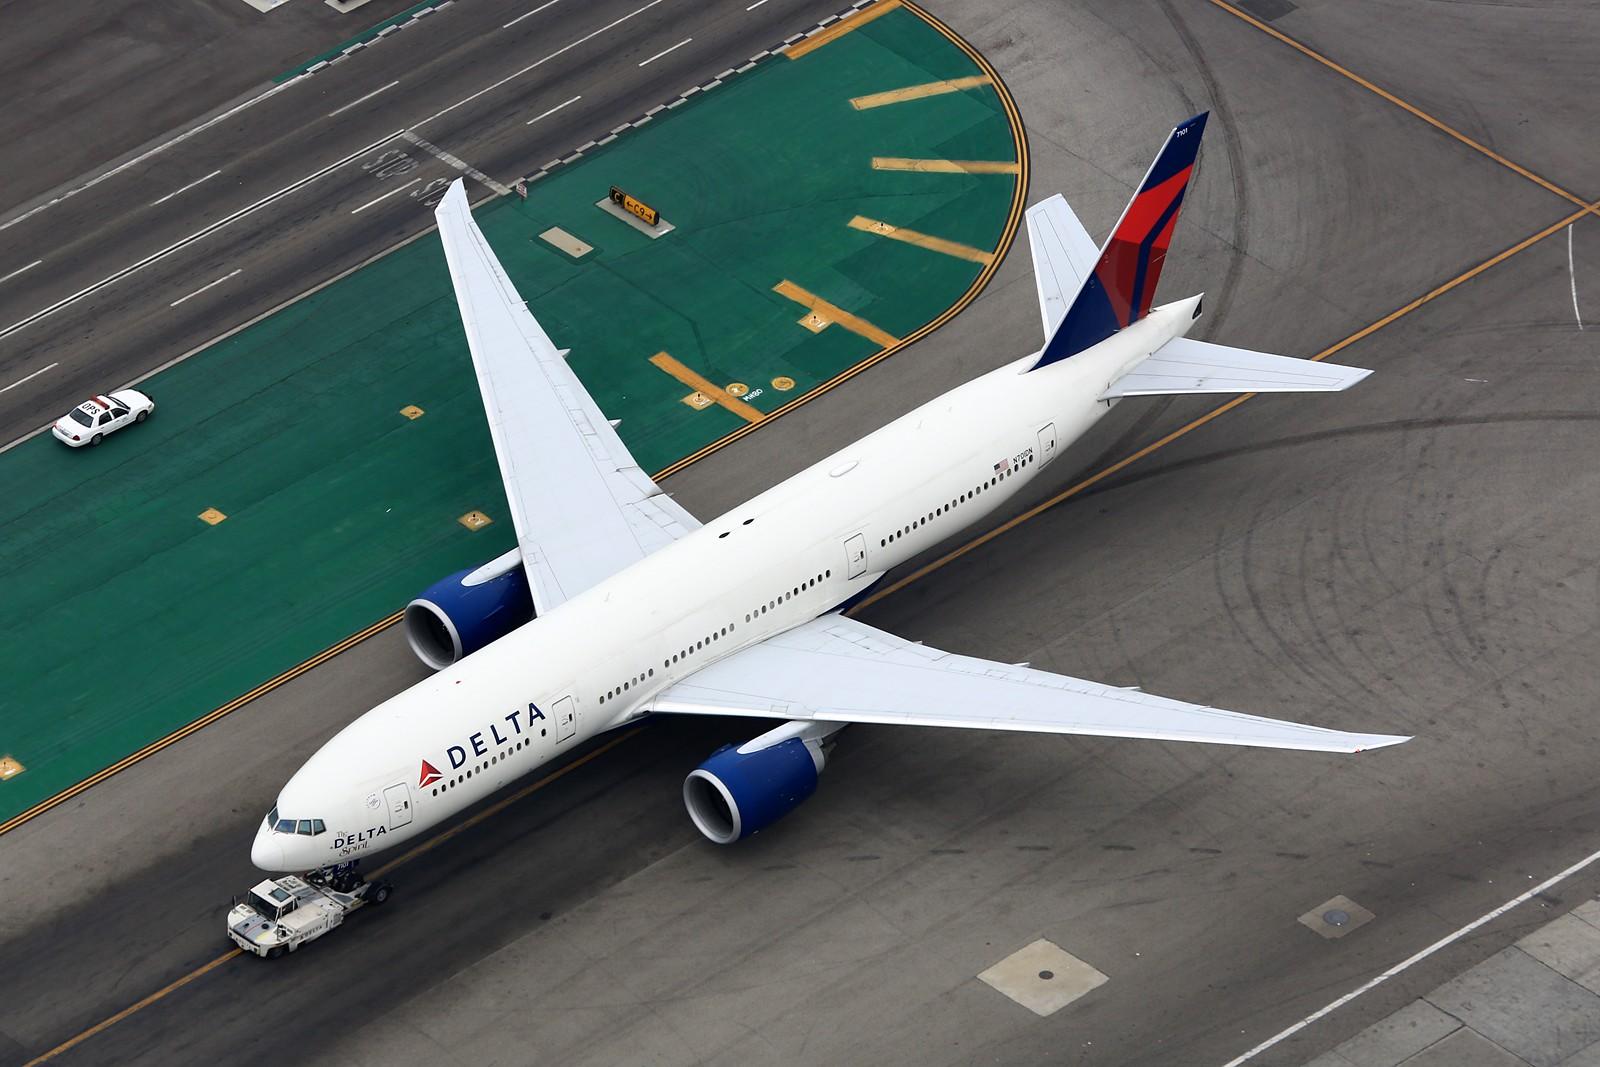 Re:[原创]【LAX】**********777级了,空对空&空对地部分777合集[1600*1067]********** BOEING 777-200LR N701DN 美国洛杉矶机场